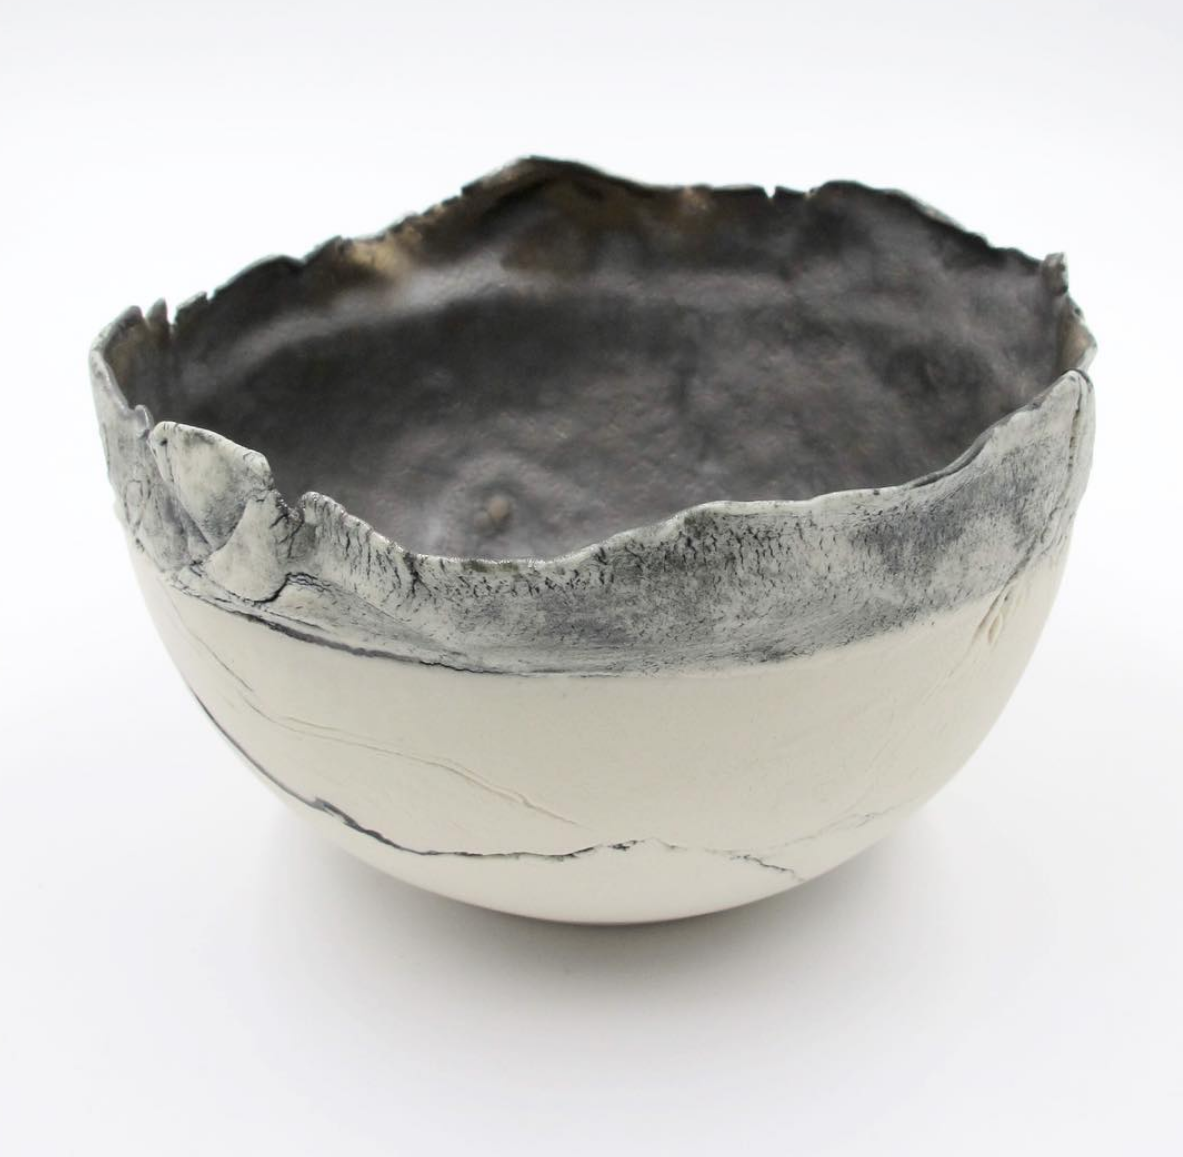 Porcelain bowl by Nicola Briggs